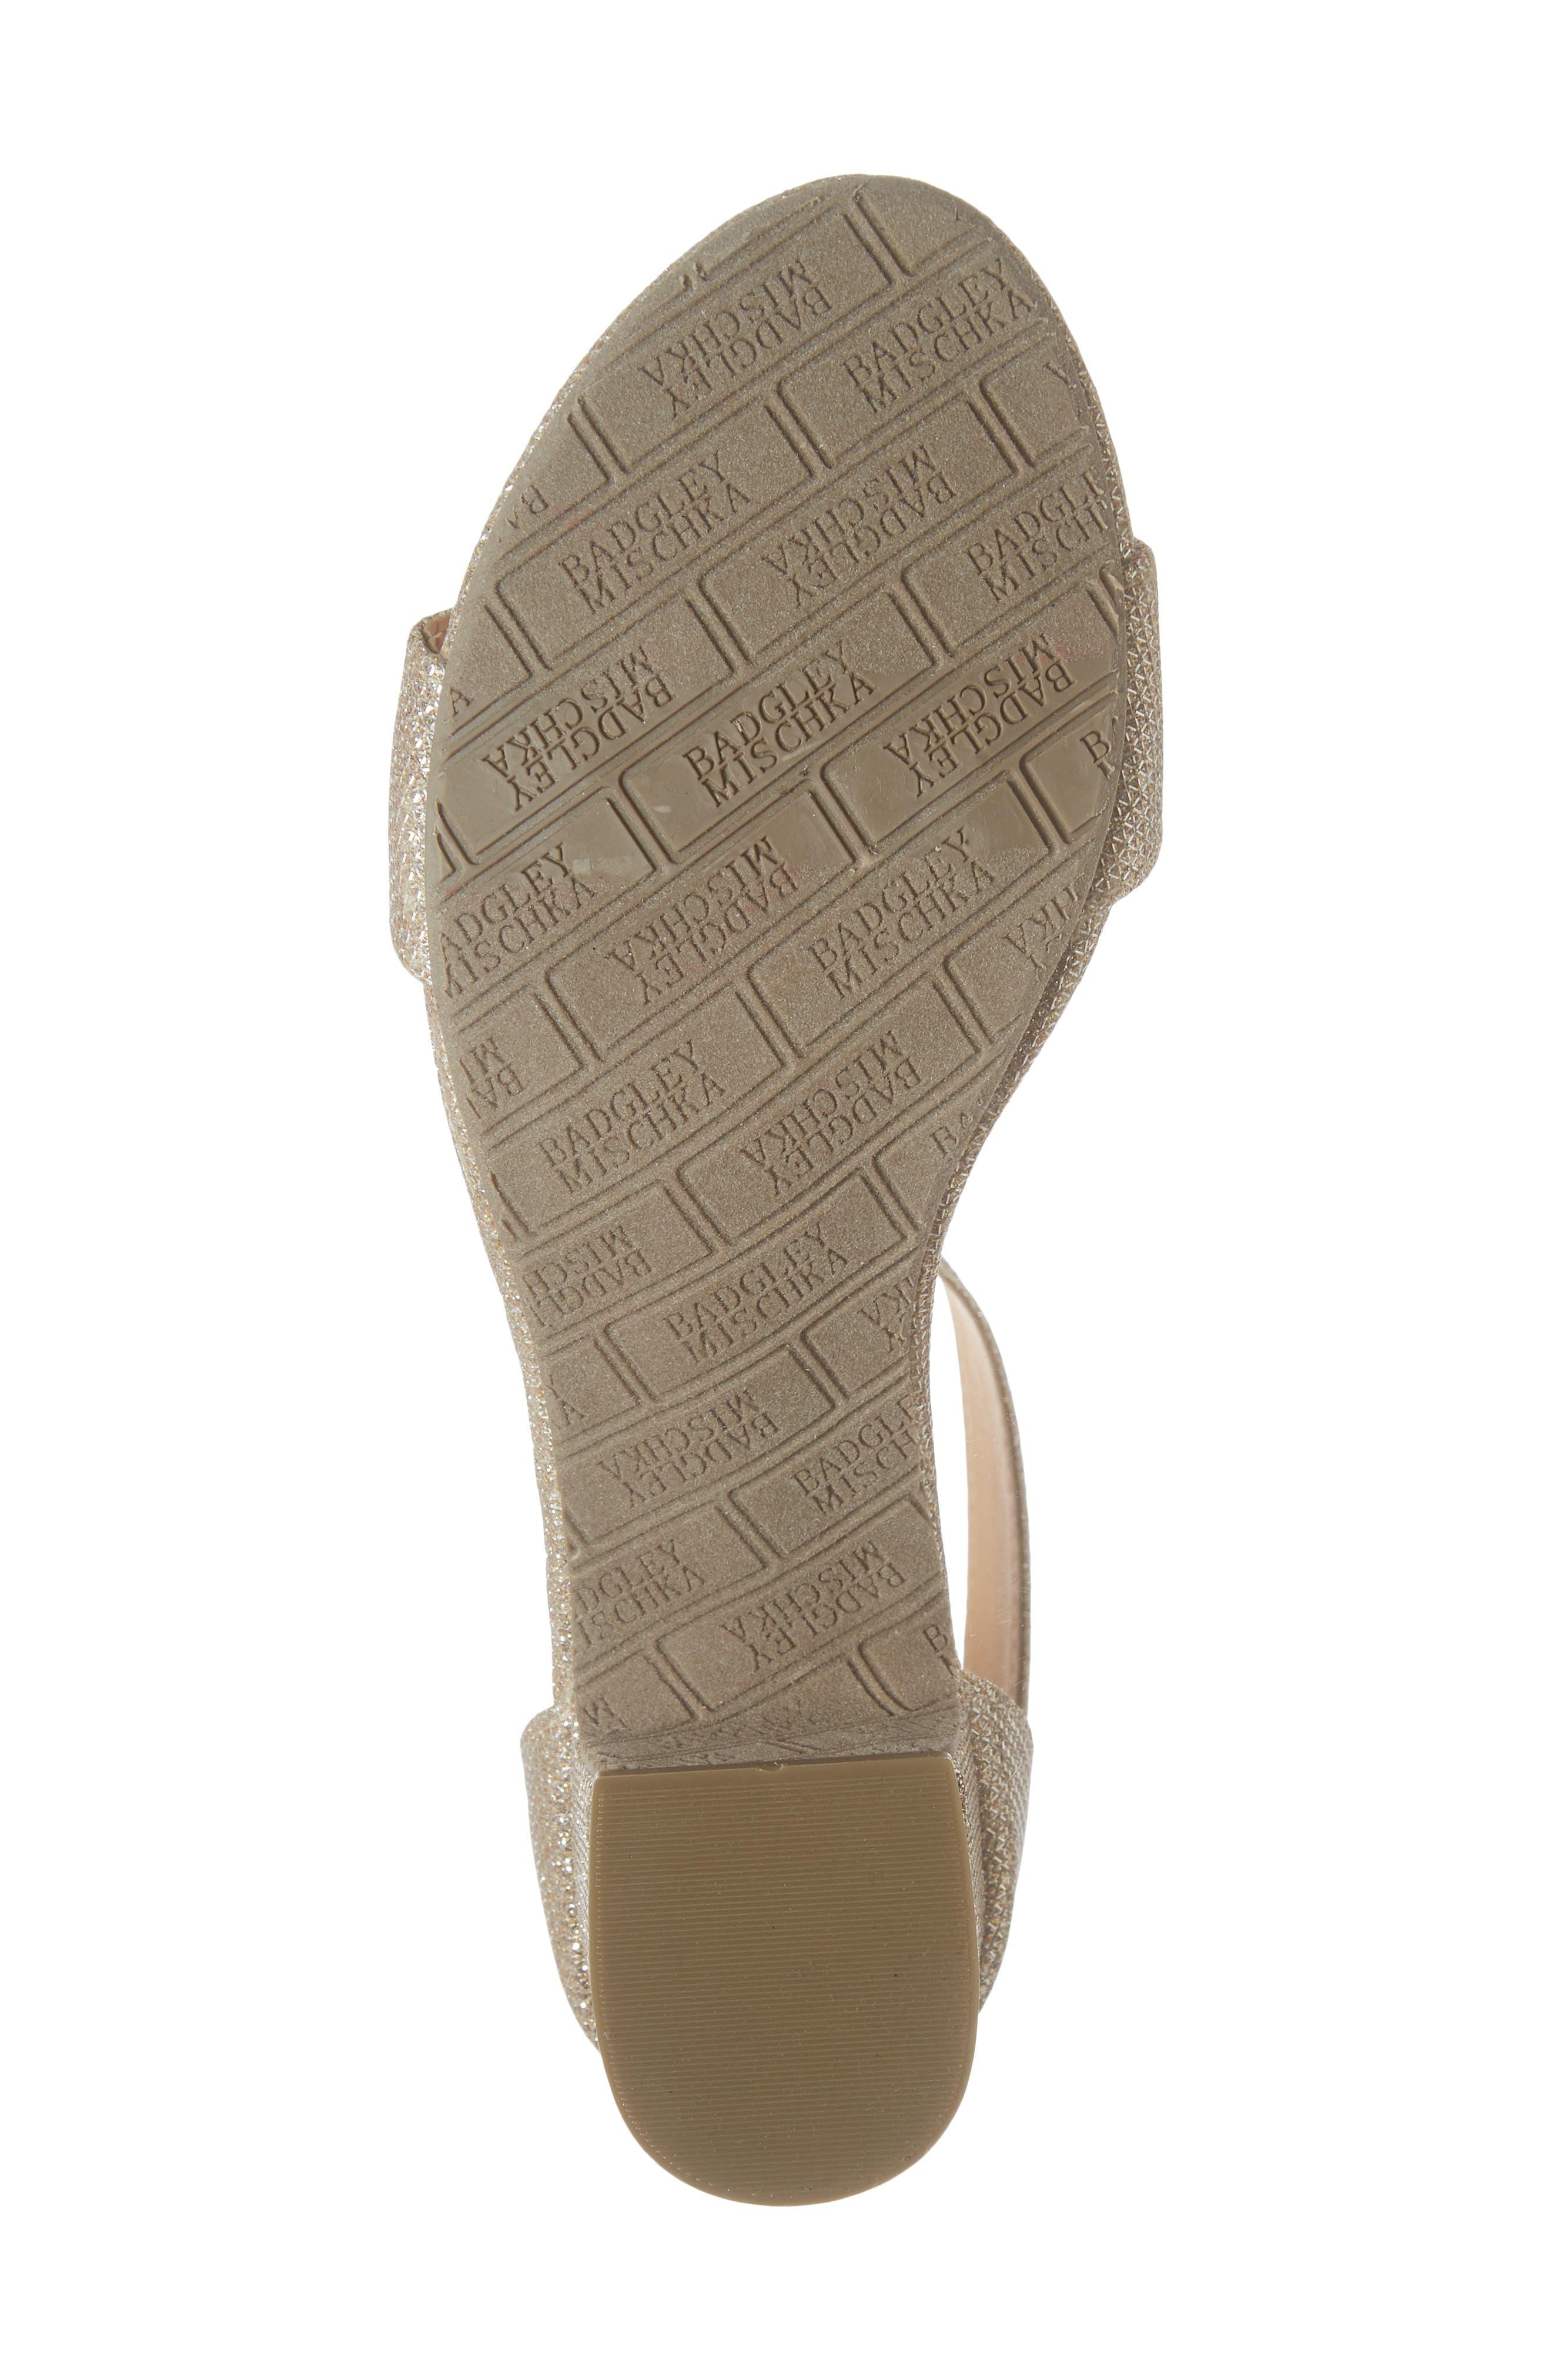 BADGLEY MISCHKA COLLECTION, Badgley Mischka Pernia Velma Shimmer Sandal, Alternate thumbnail 6, color, LIGHT GOLD SHIMMER